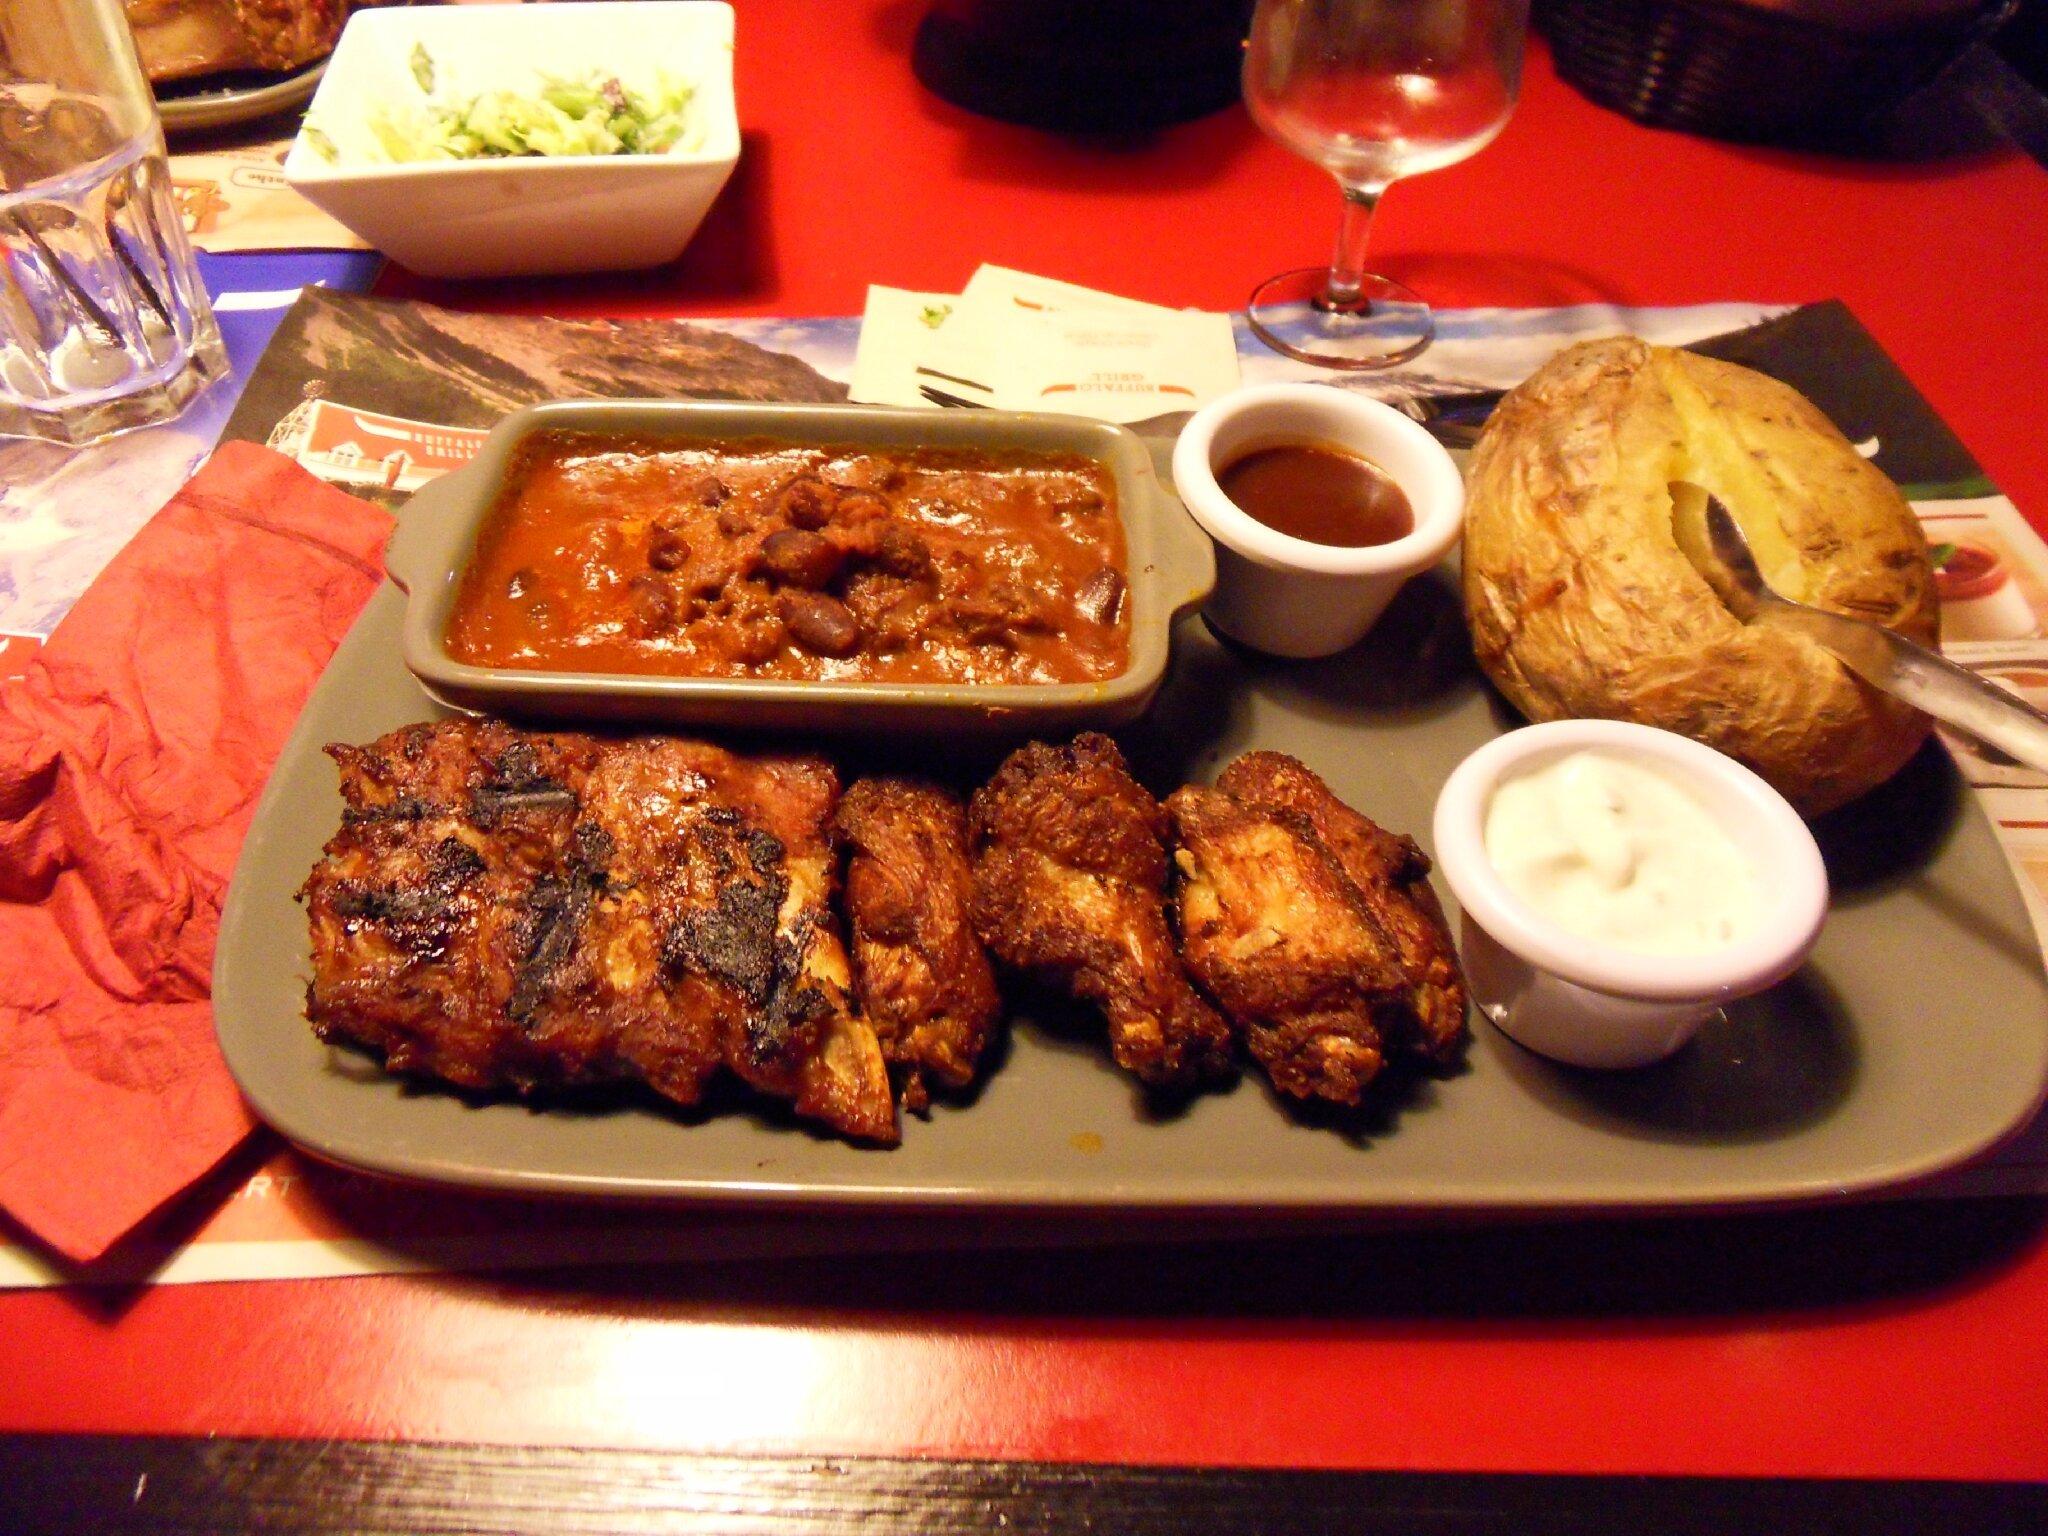 Buffalo grill voyagesvacances - Menu buffalo grill tarif ...